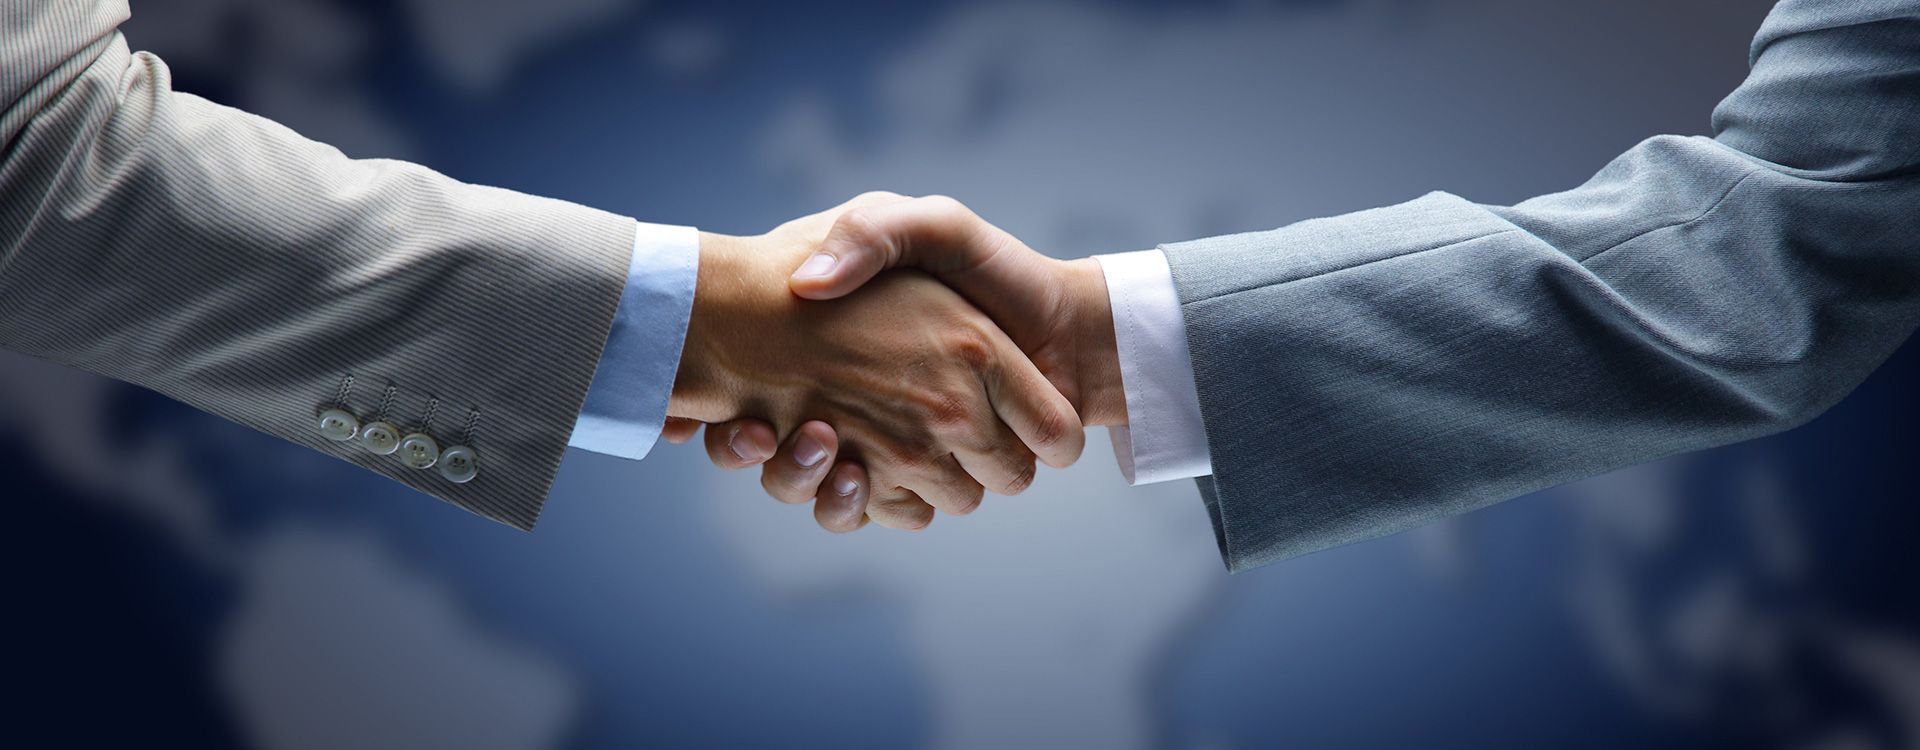 Partnership UCapital International Franchise companies